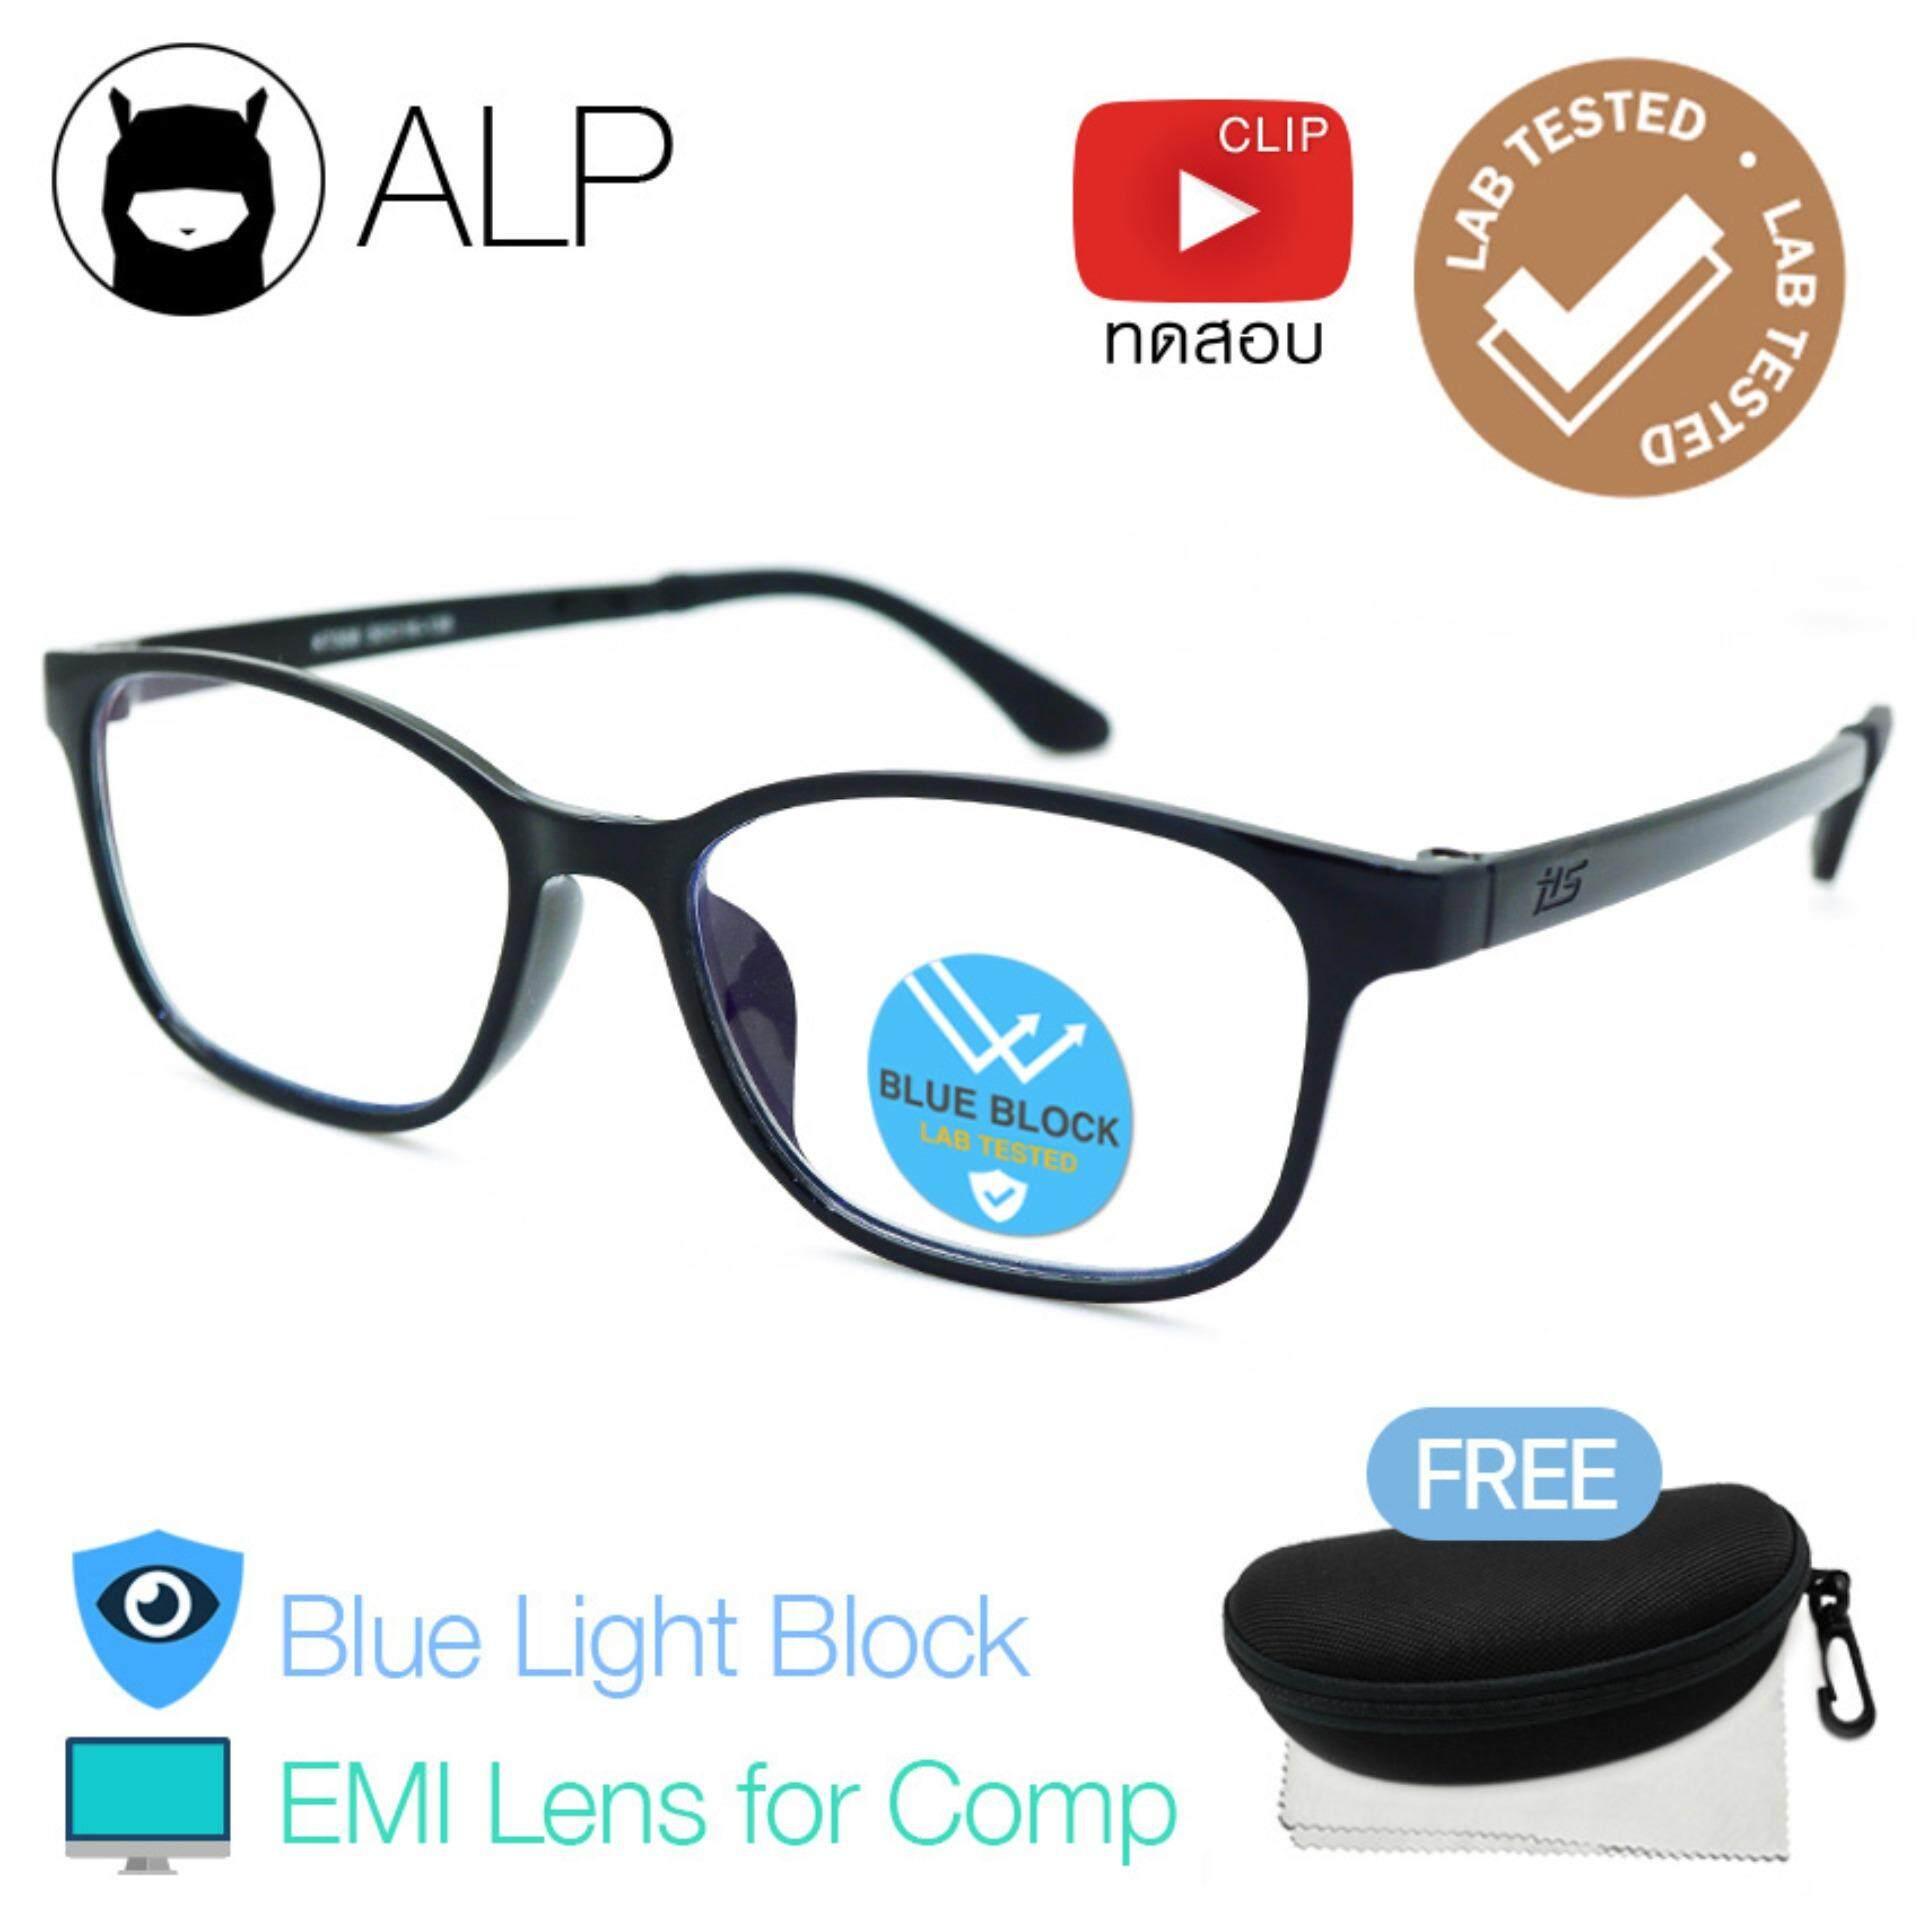 Alp Emi Computer Glasses แว่นคอมพิวเตอร์ กรองแสงสีฟ้า Blue Light Block  กันรังสี Uv, Uva, Uvb กรอบแว่นตา แว่นสายตา แว่นเลนส์ใส Square Style รุ่น Alp-E014-Bks-Emi (black/clear).